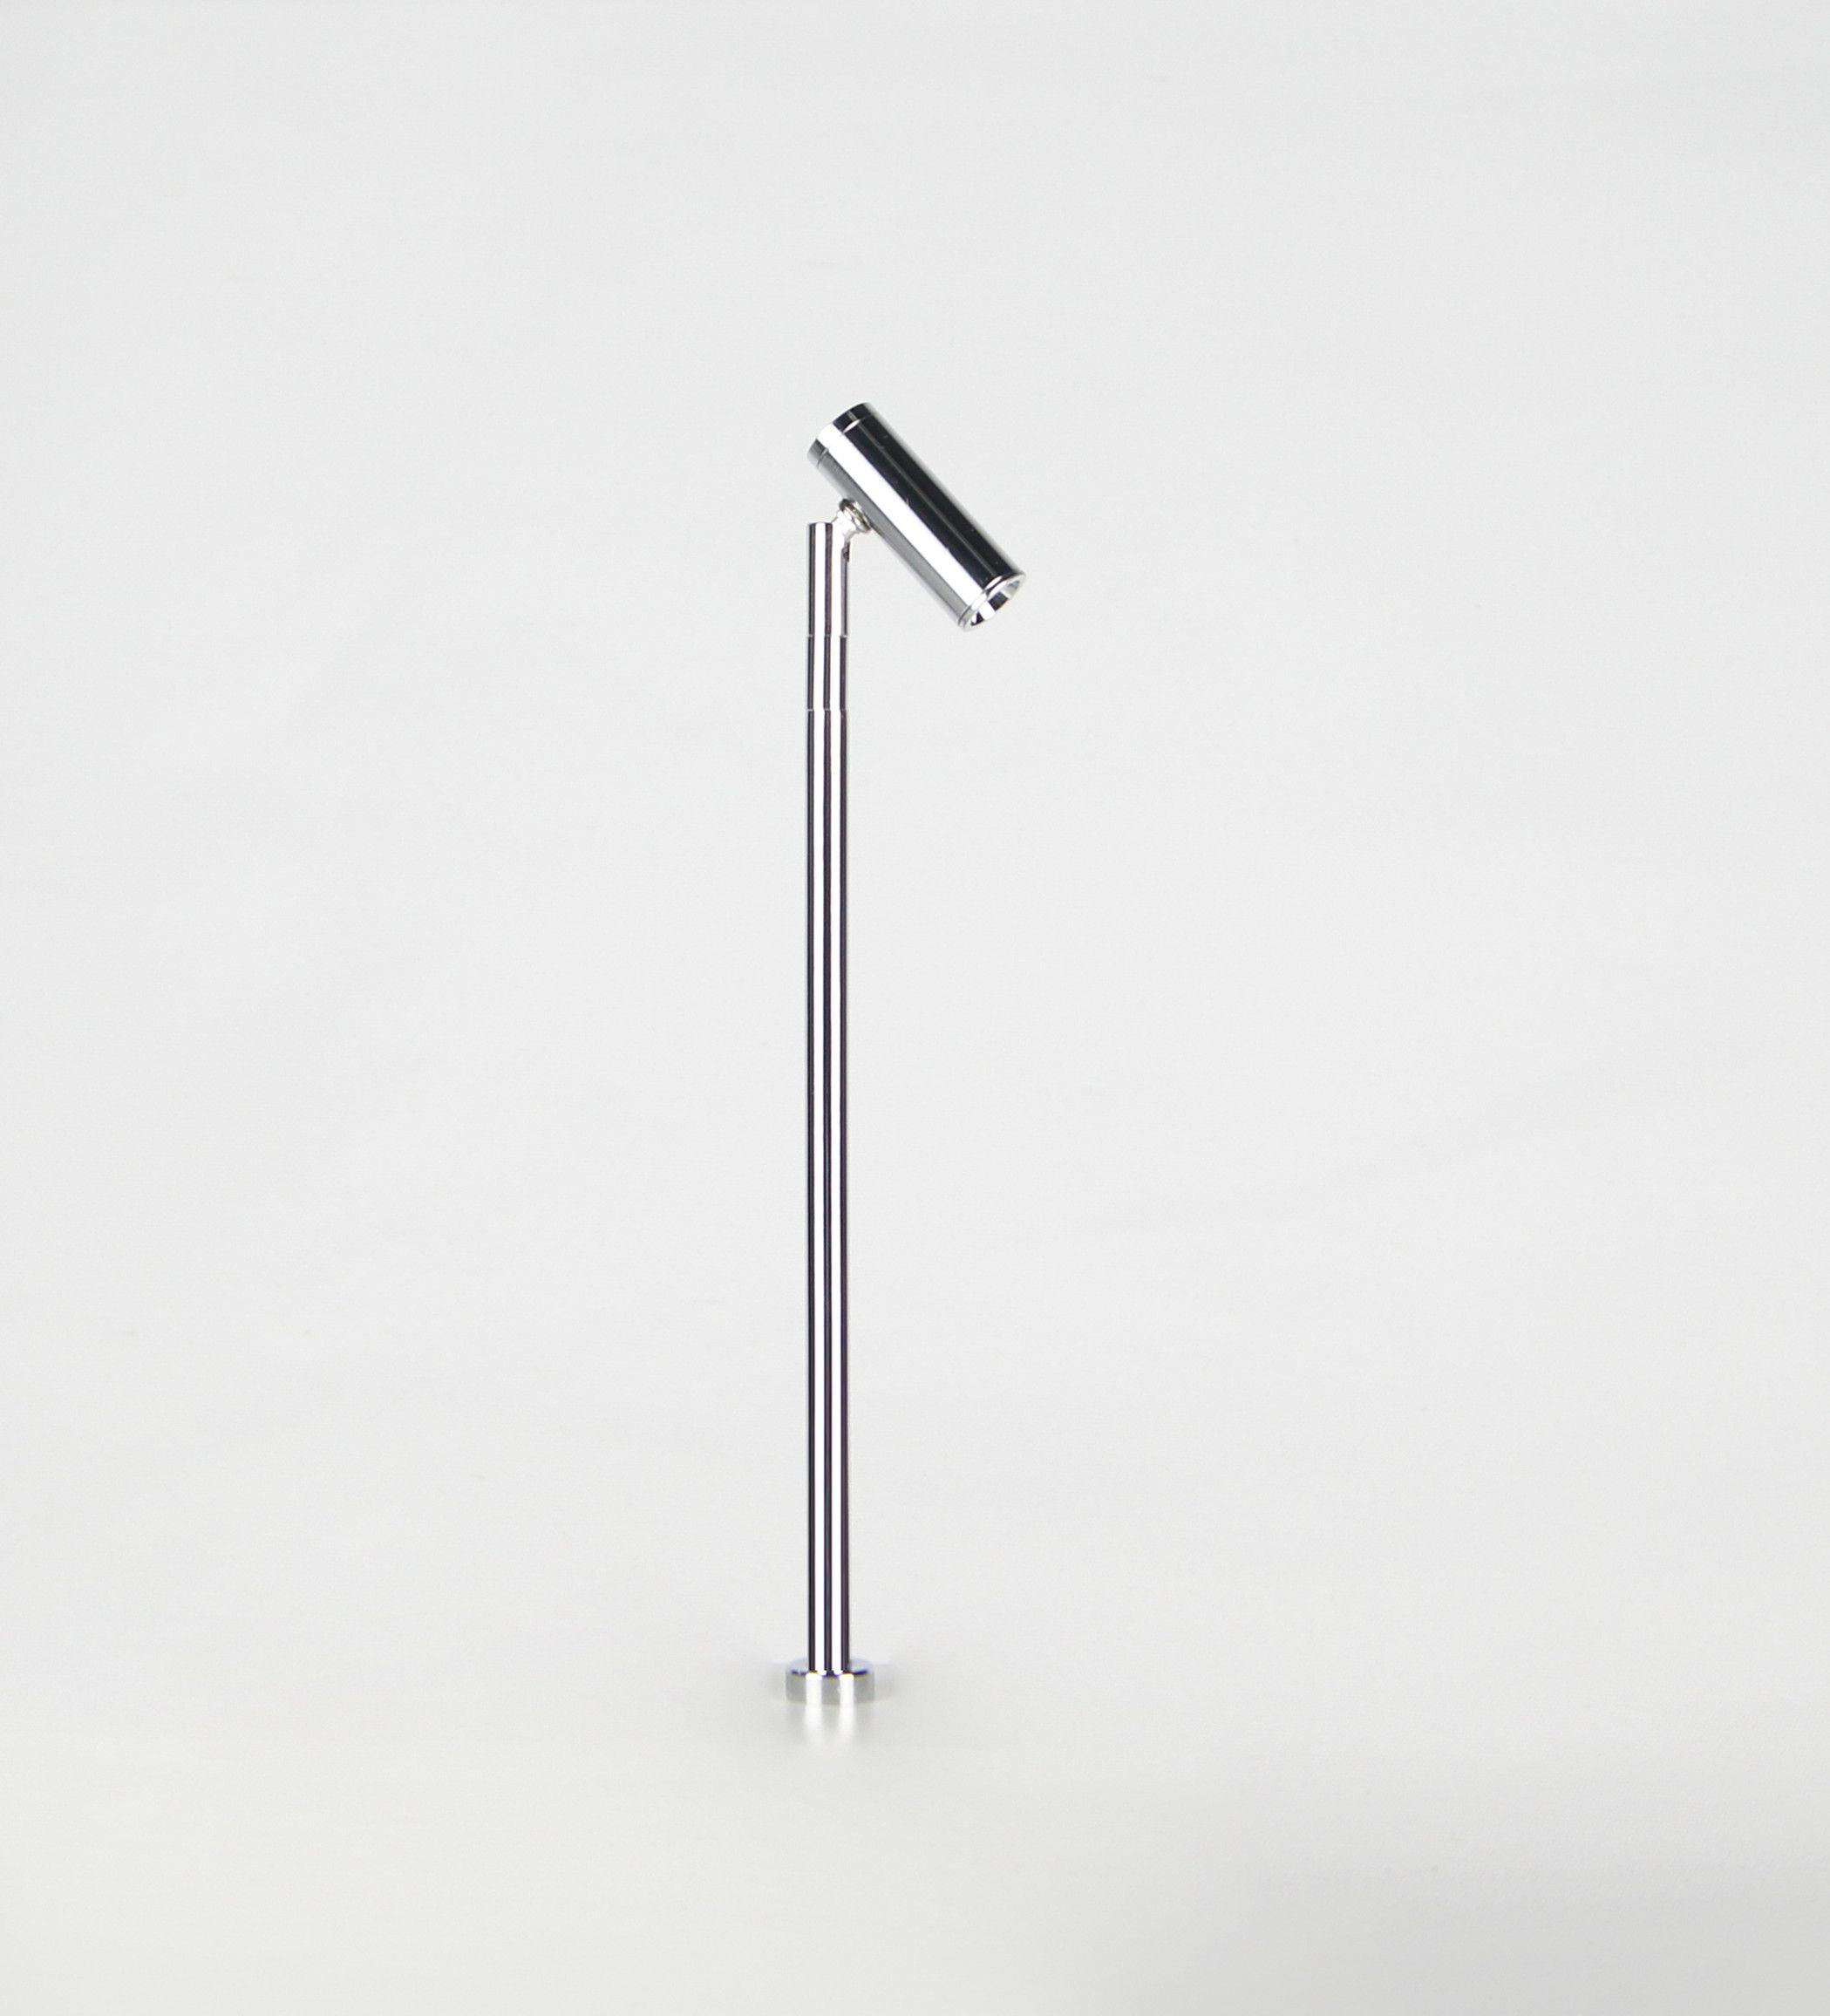 Name: Led Showcase Lighting, Led Cabinet Lighting, Led Standing ...